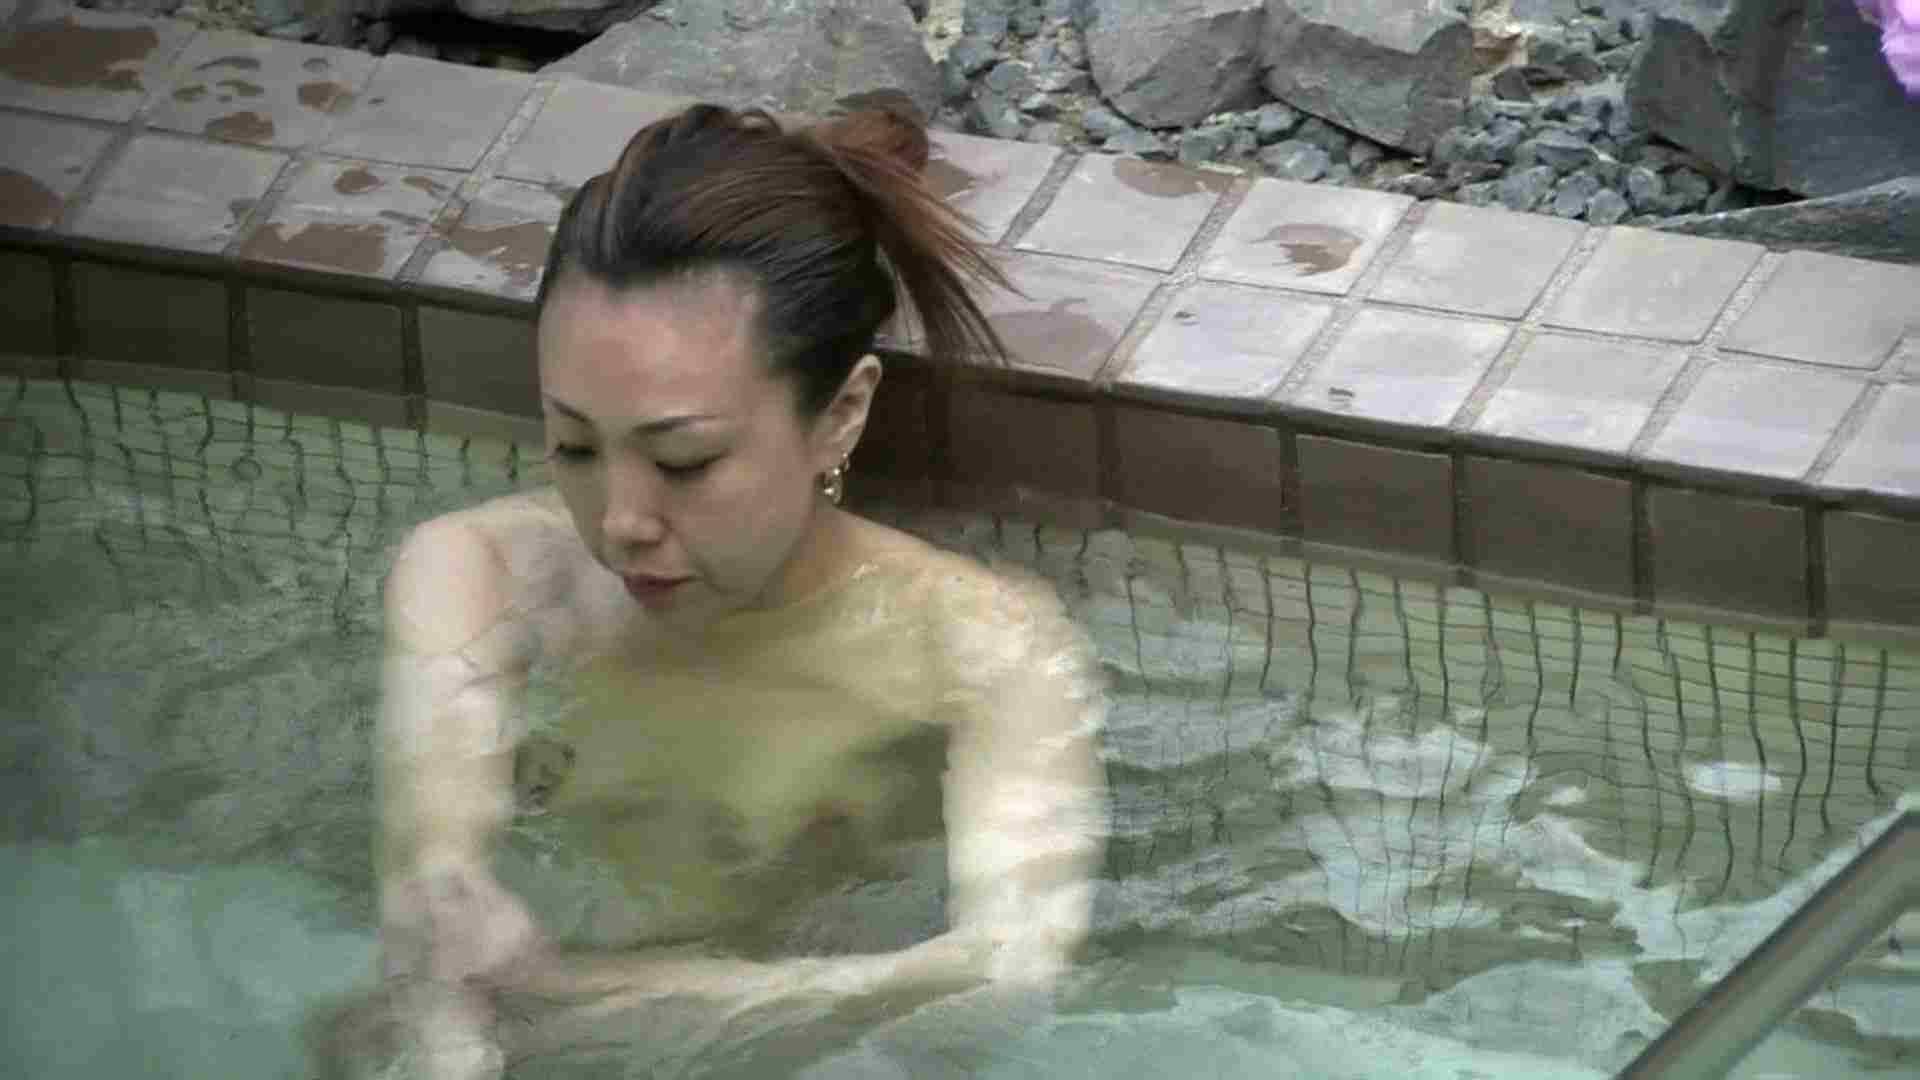 Aquaな露天風呂Vol.654 OLすけべ画像   盗撮  38連発 1